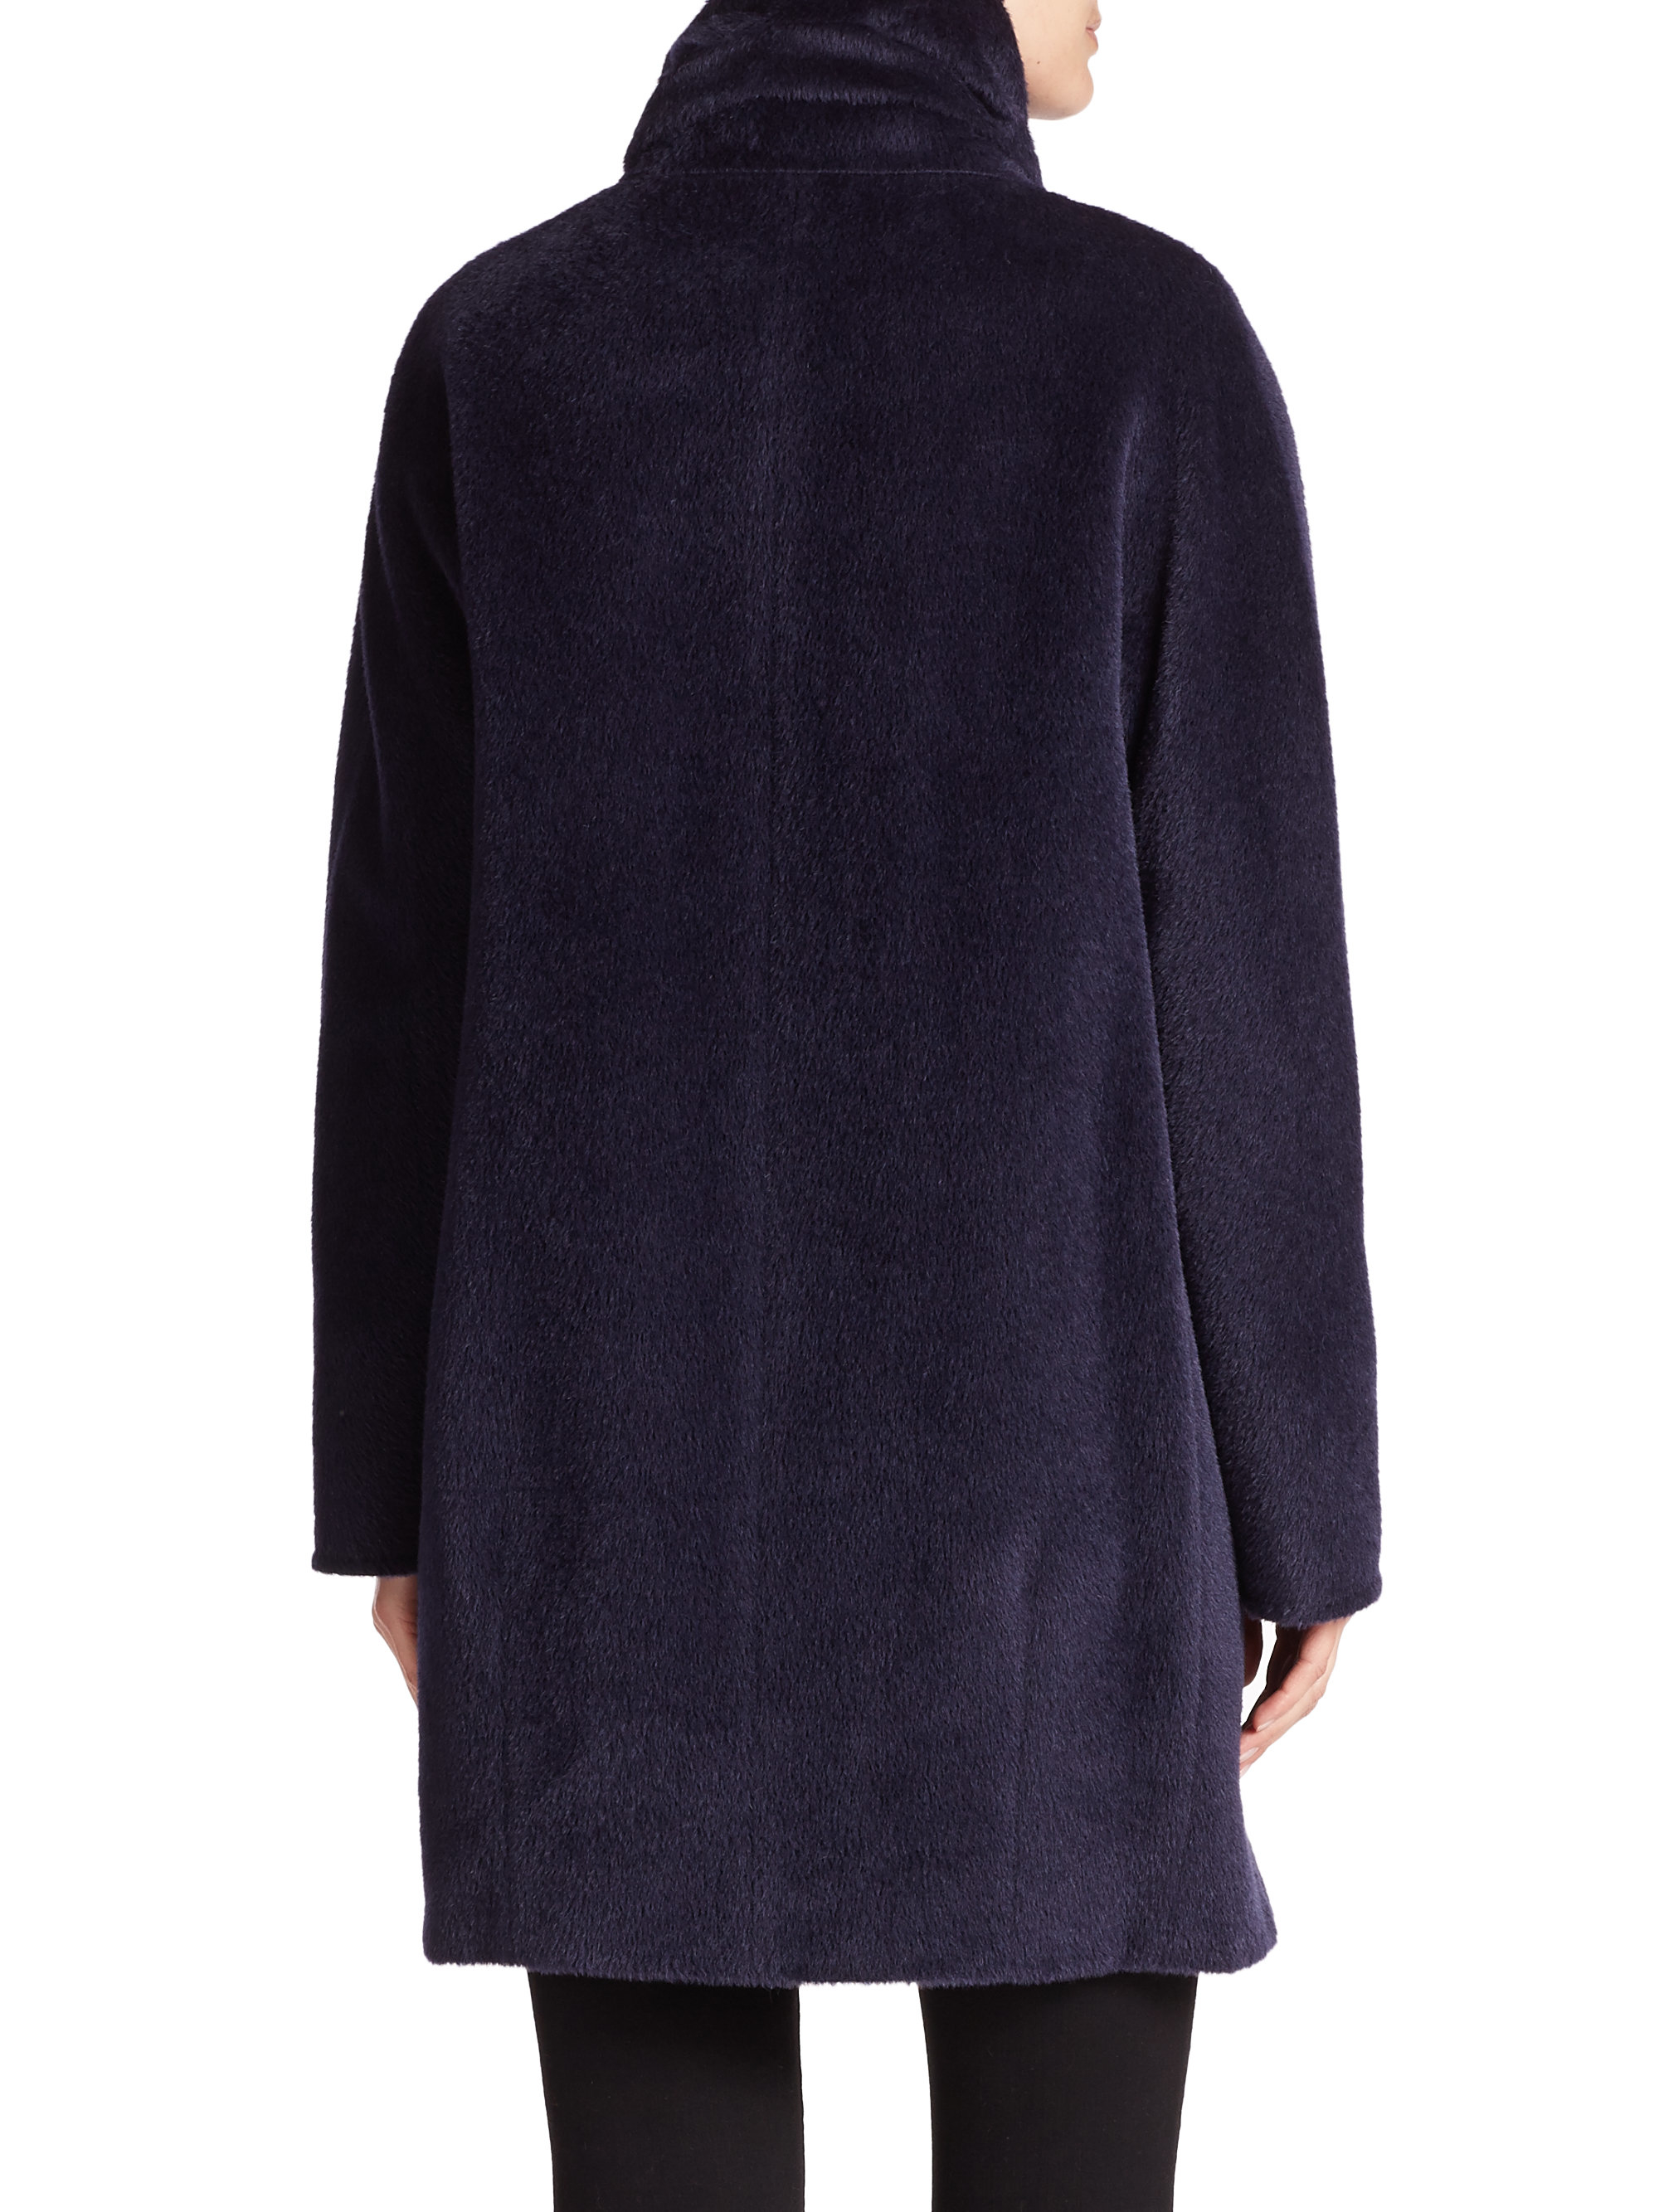 Cinzia Rocca Llama Amp Wool Blend Coat In Blue Navy Lyst